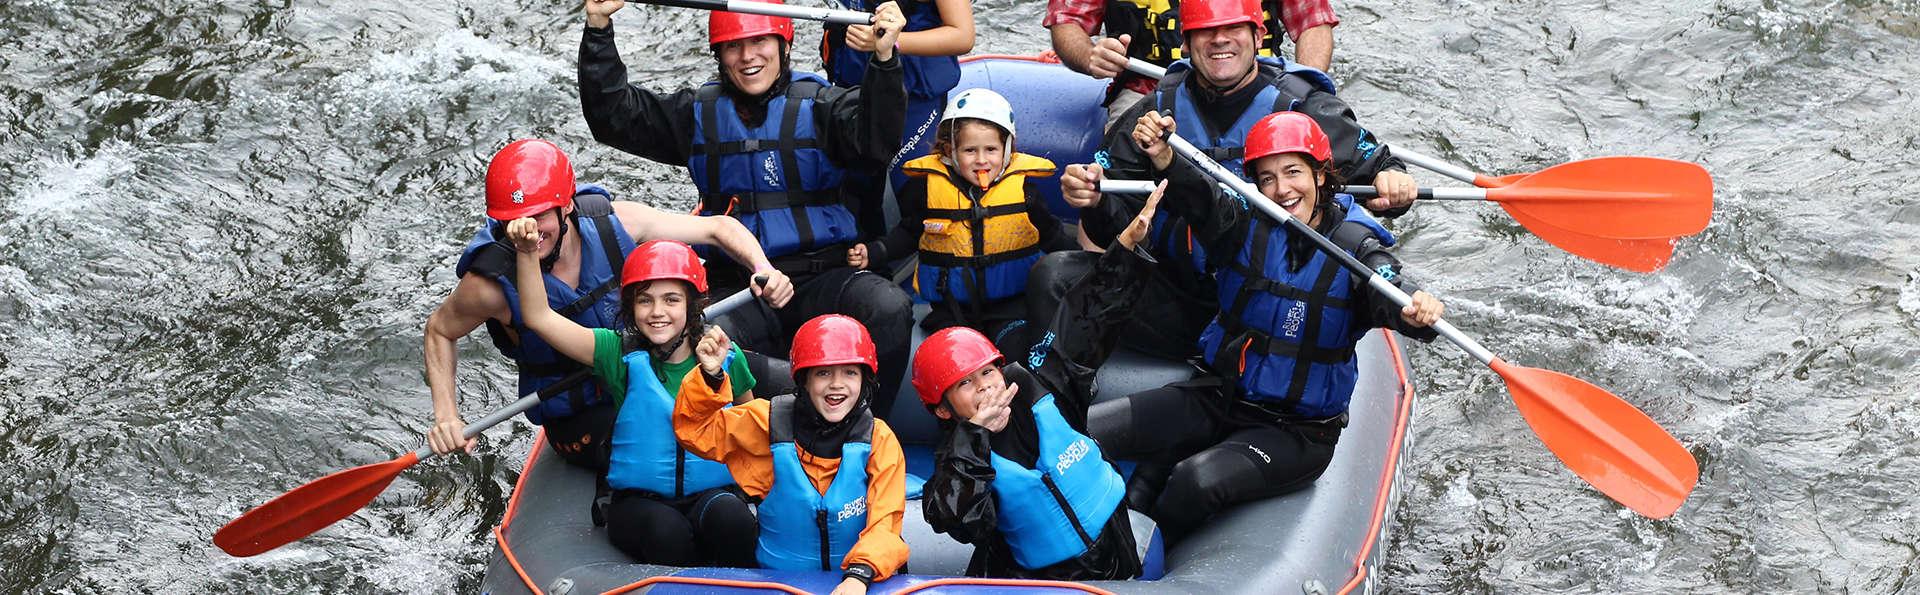 RVHotels Condes del Pallars - EDIT_rafting.jpg